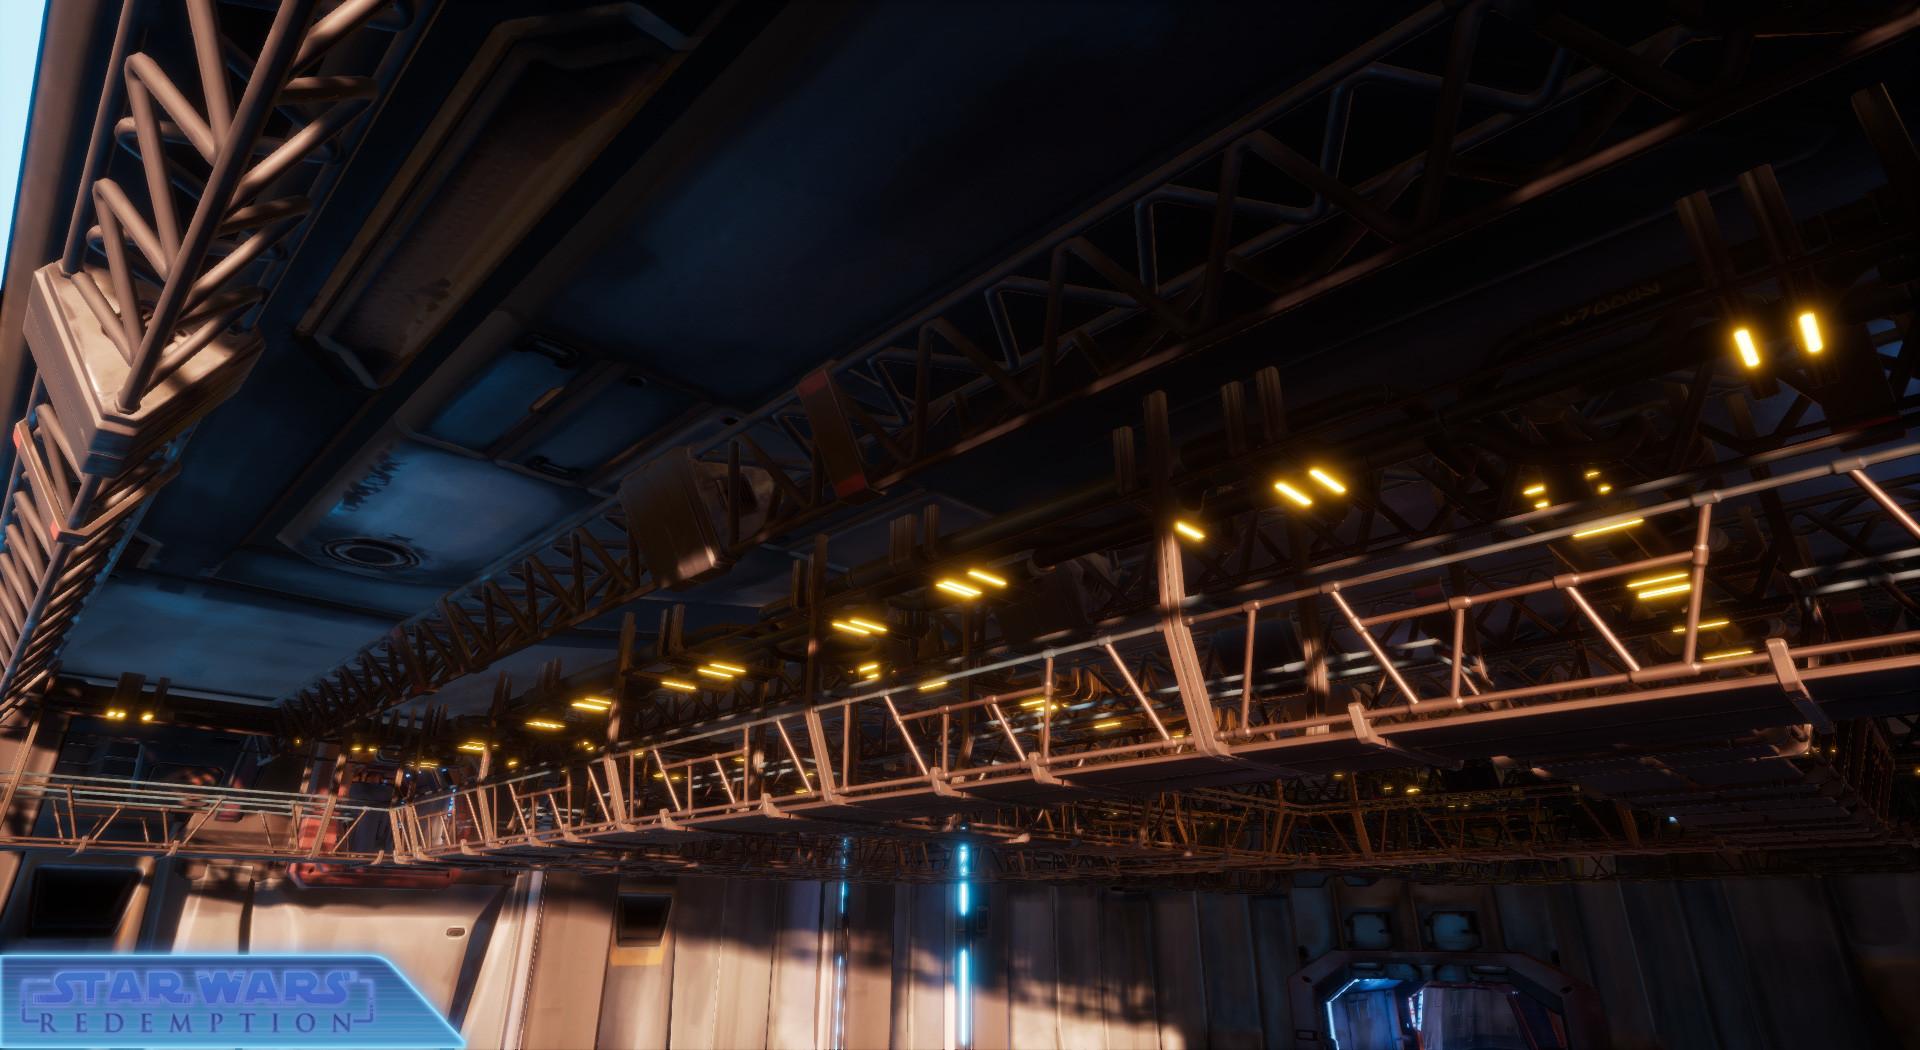 Etienne beschet hangar ceiling rework